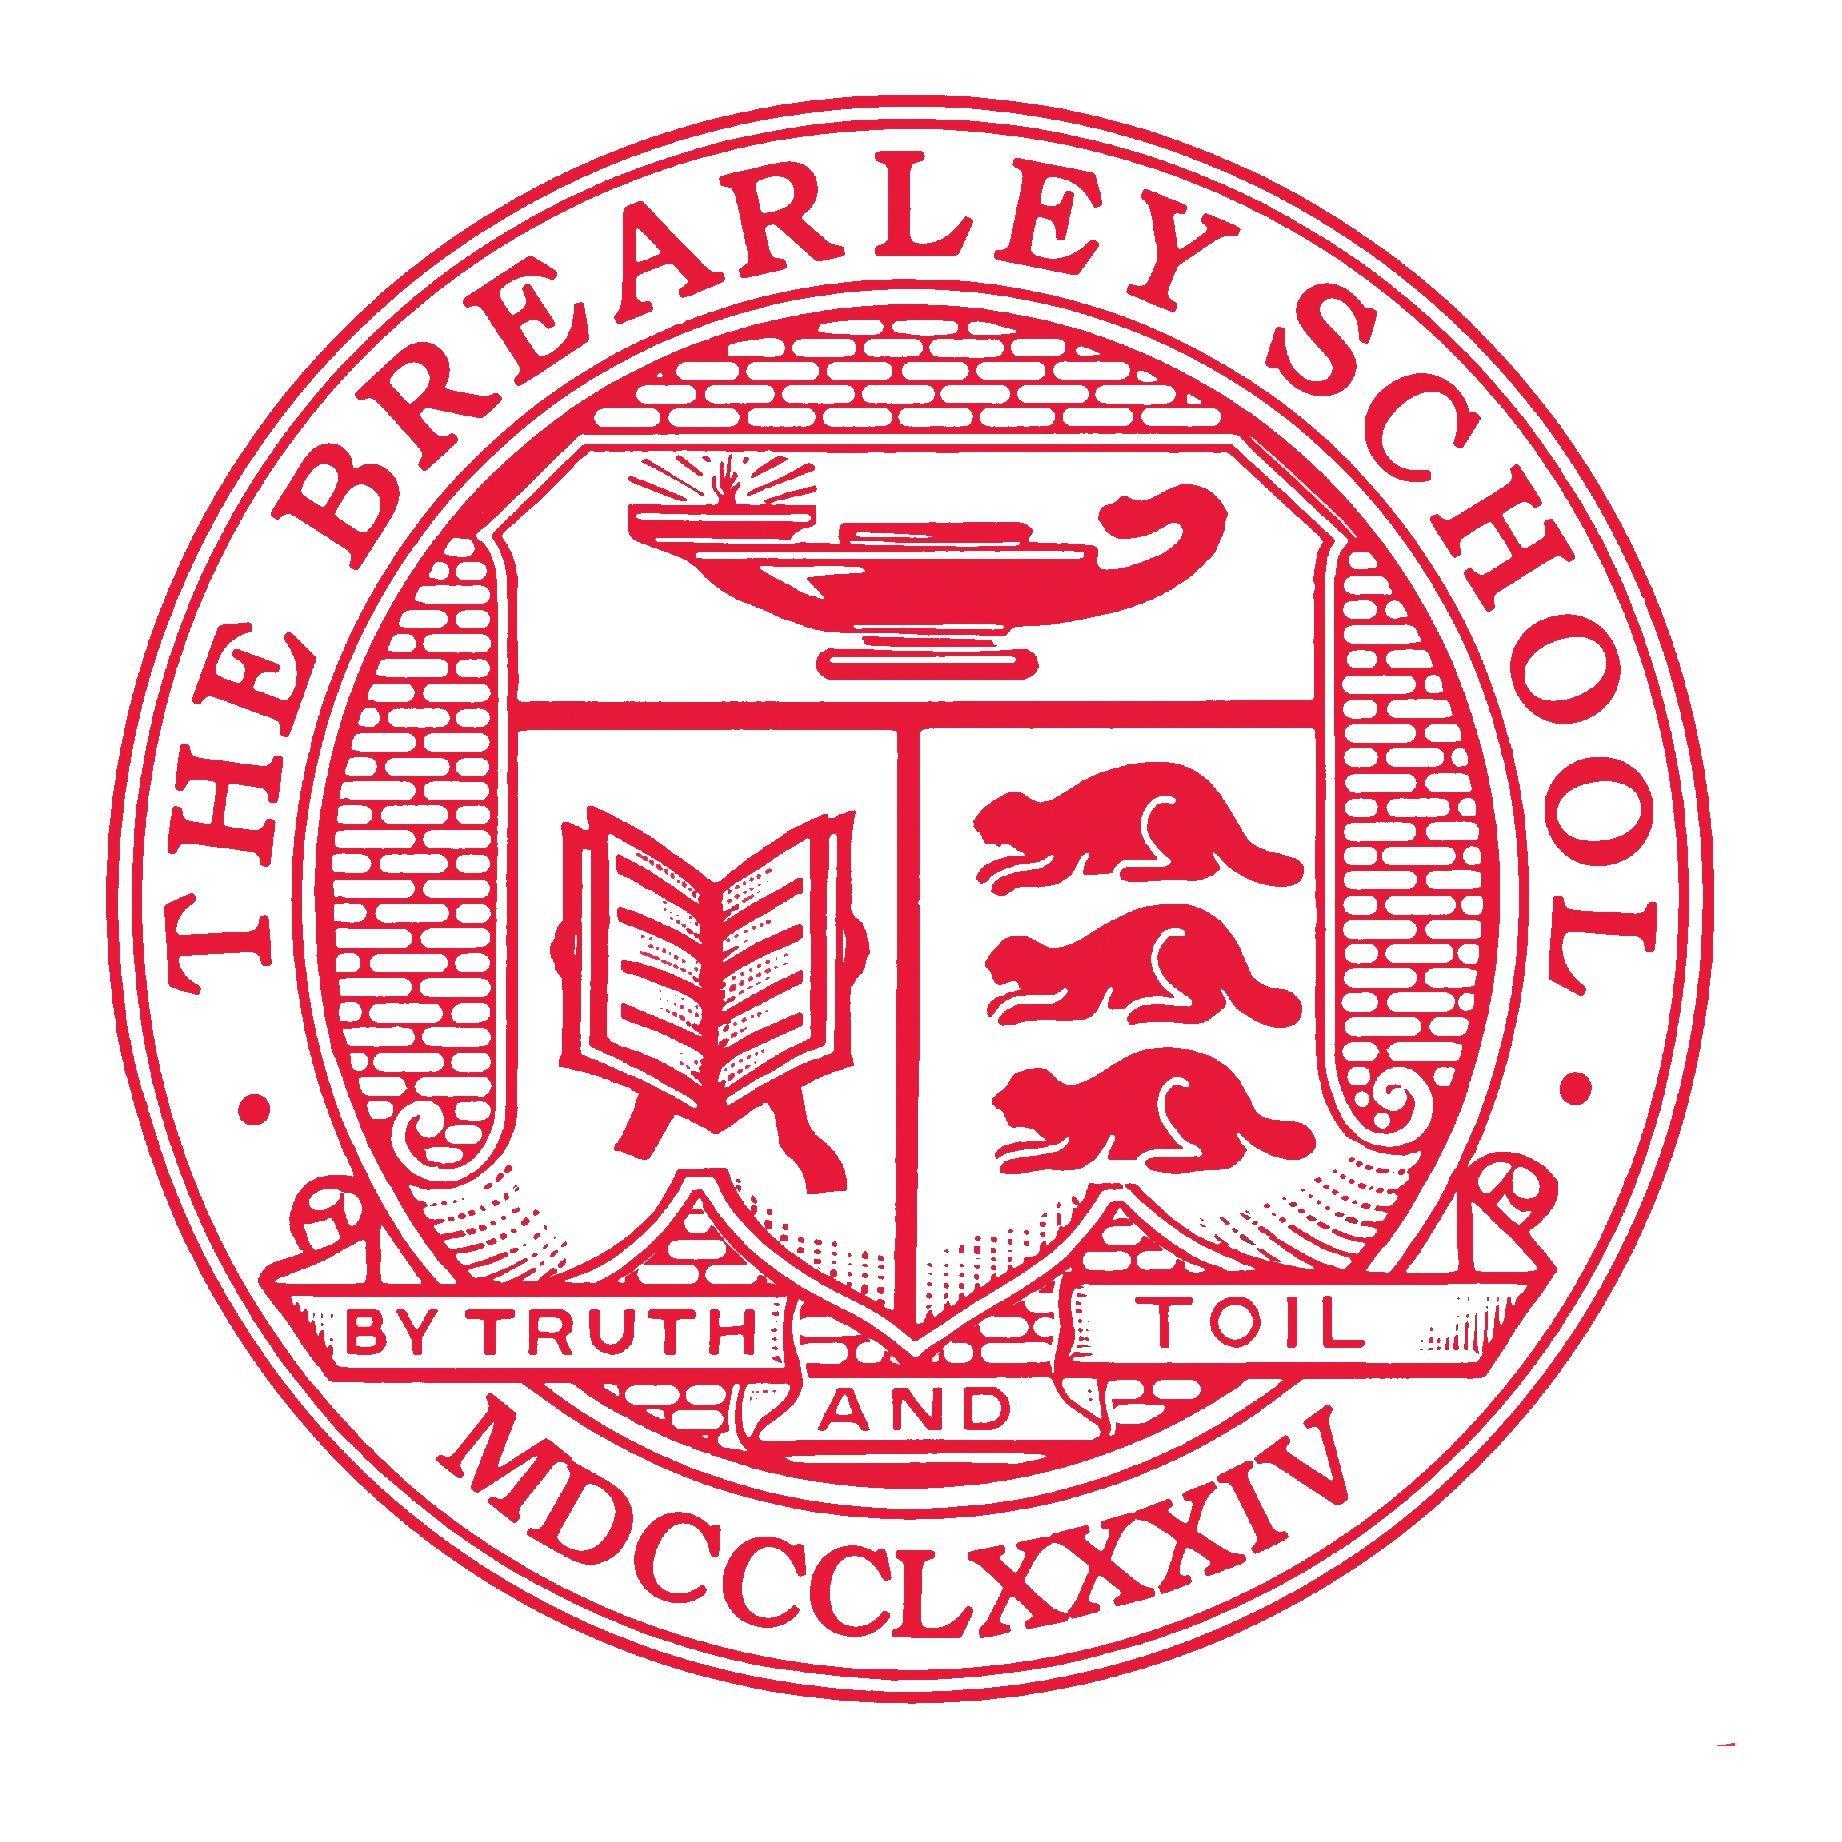 The Brearley School